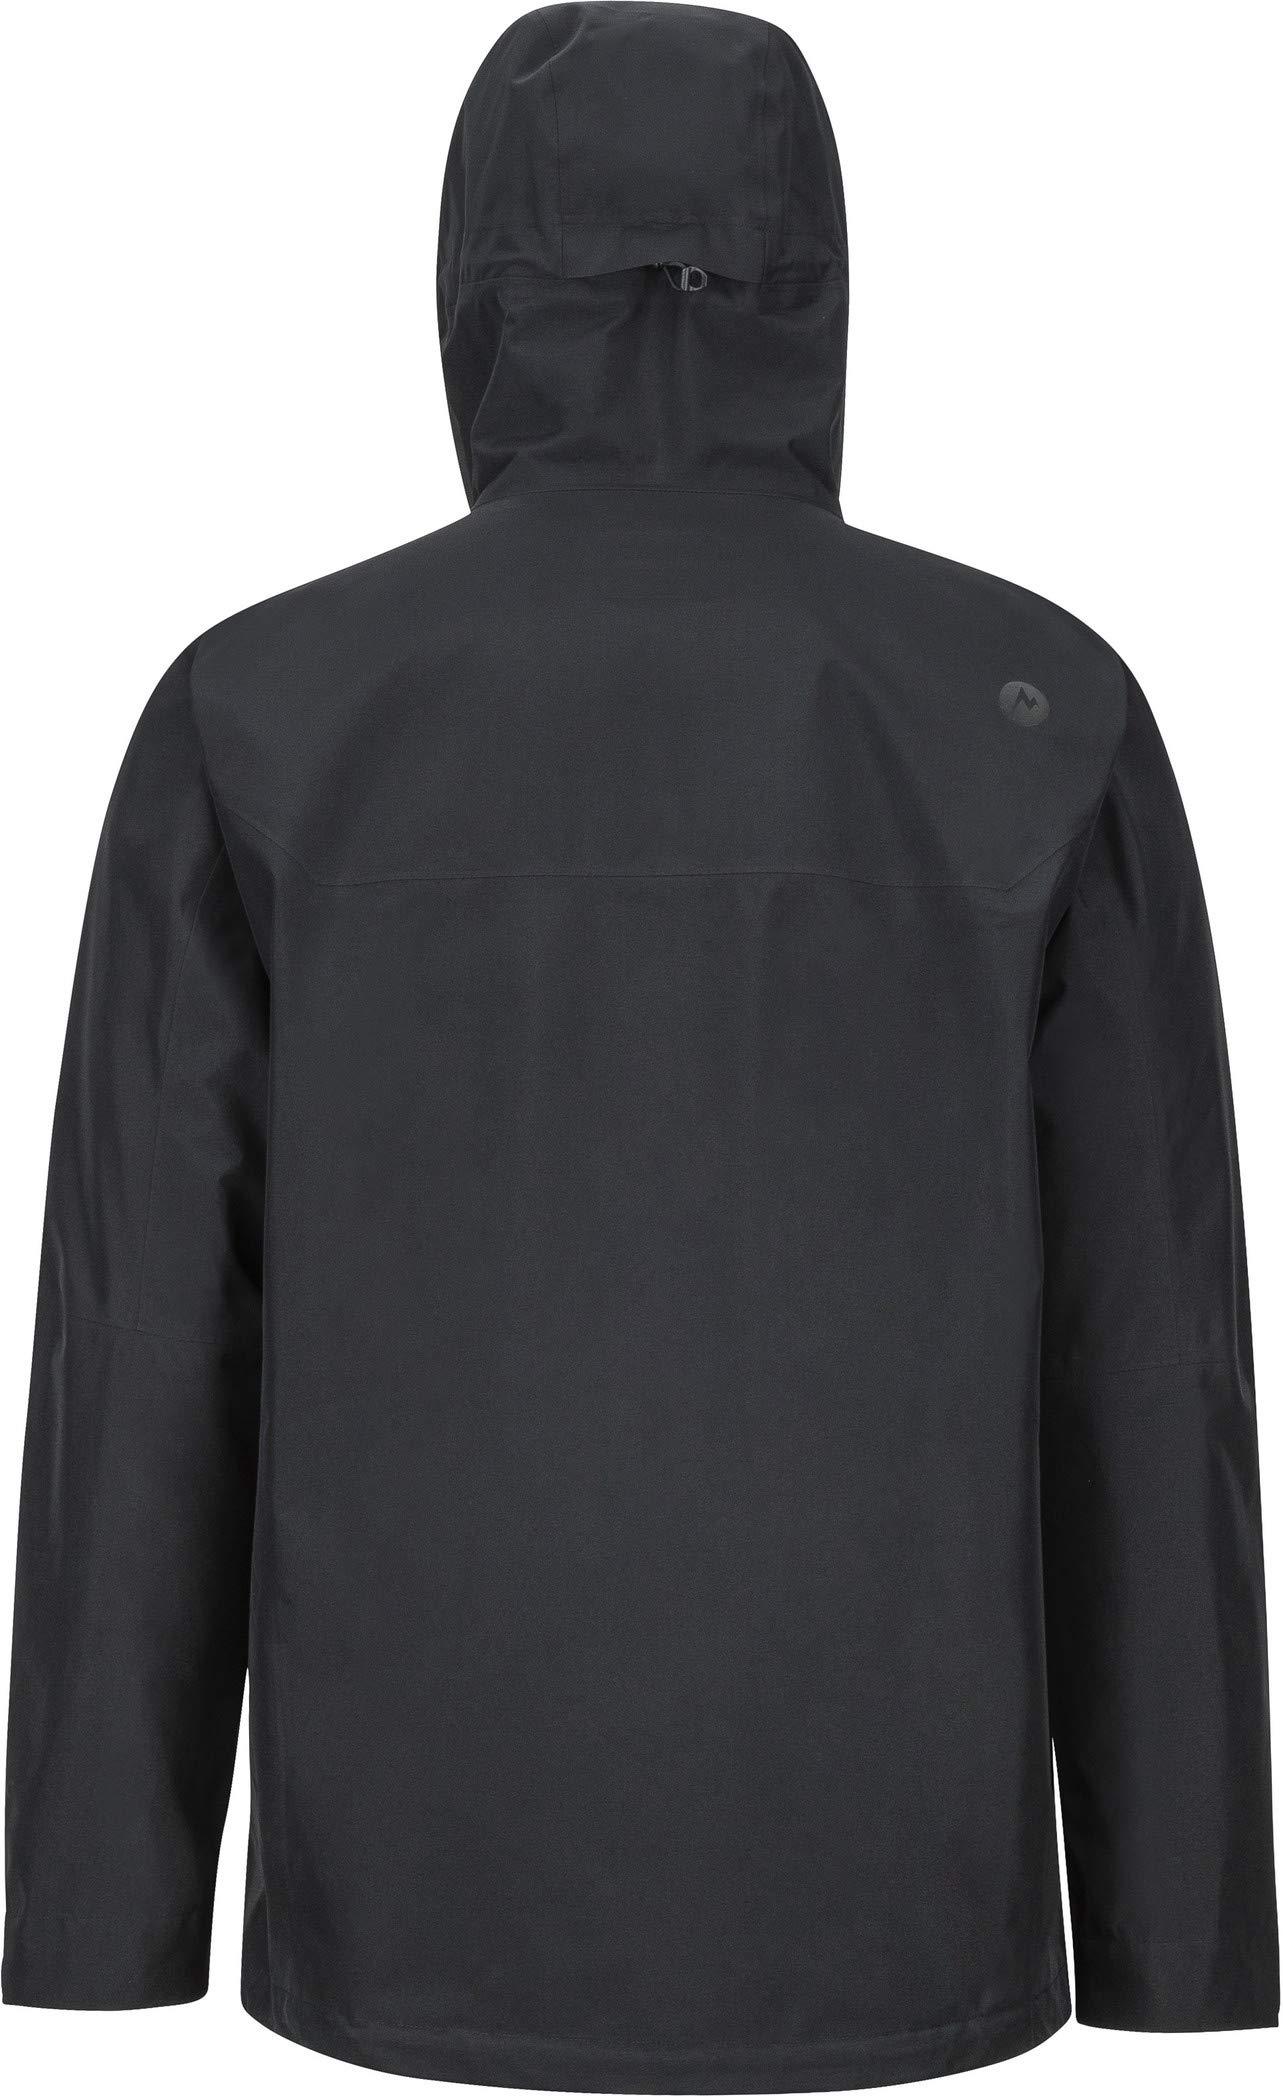 713h1IbvjhL - Marmot Children's Minimalist Component' Jacket